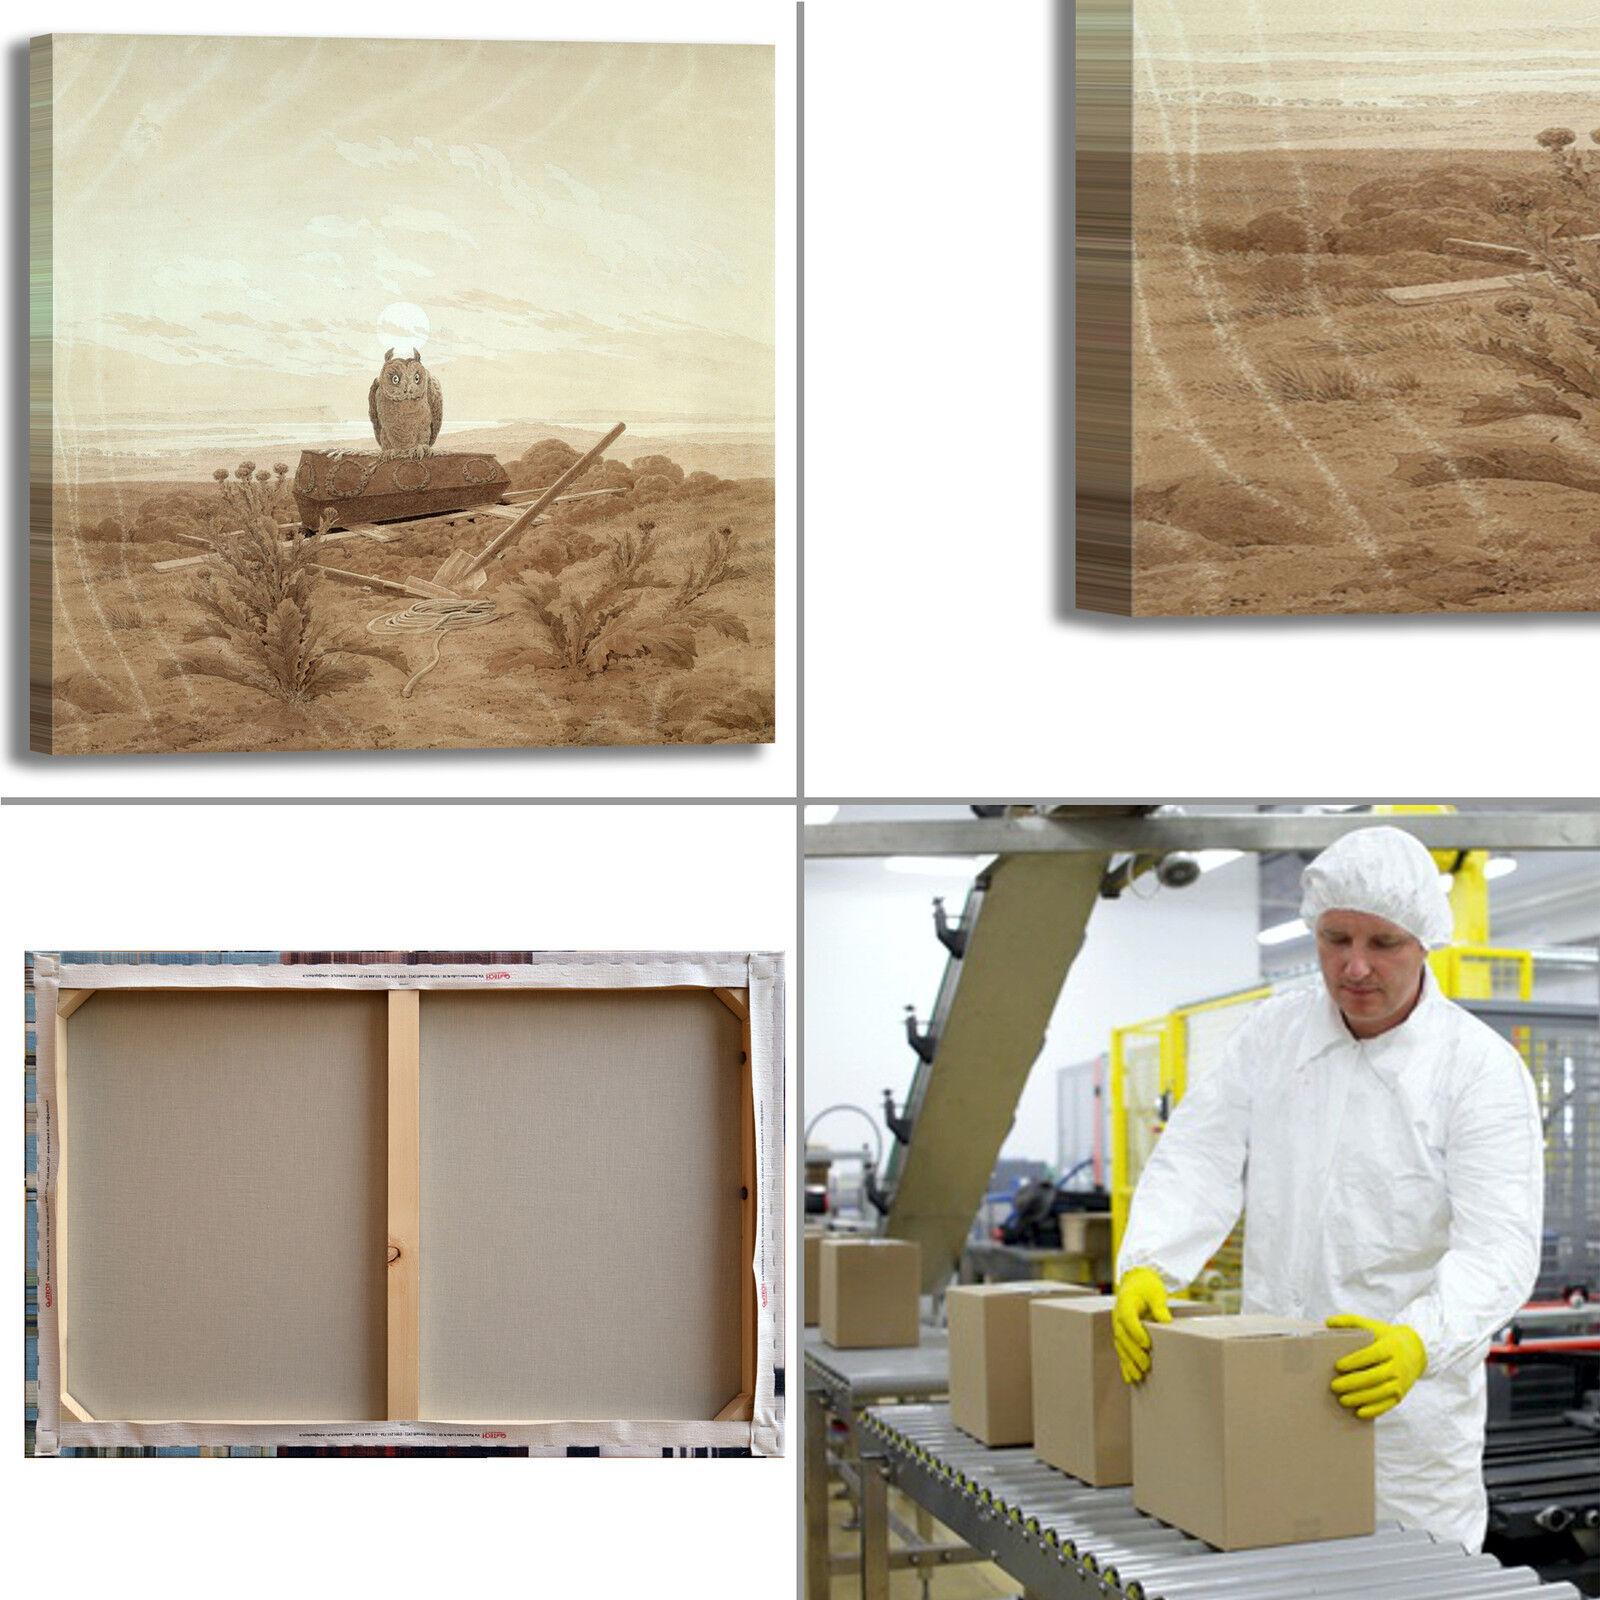 Caspar dipinto paesaggio con gufo design quadro stampa tela dipinto Caspar telaio arRouge o casa 1d619a